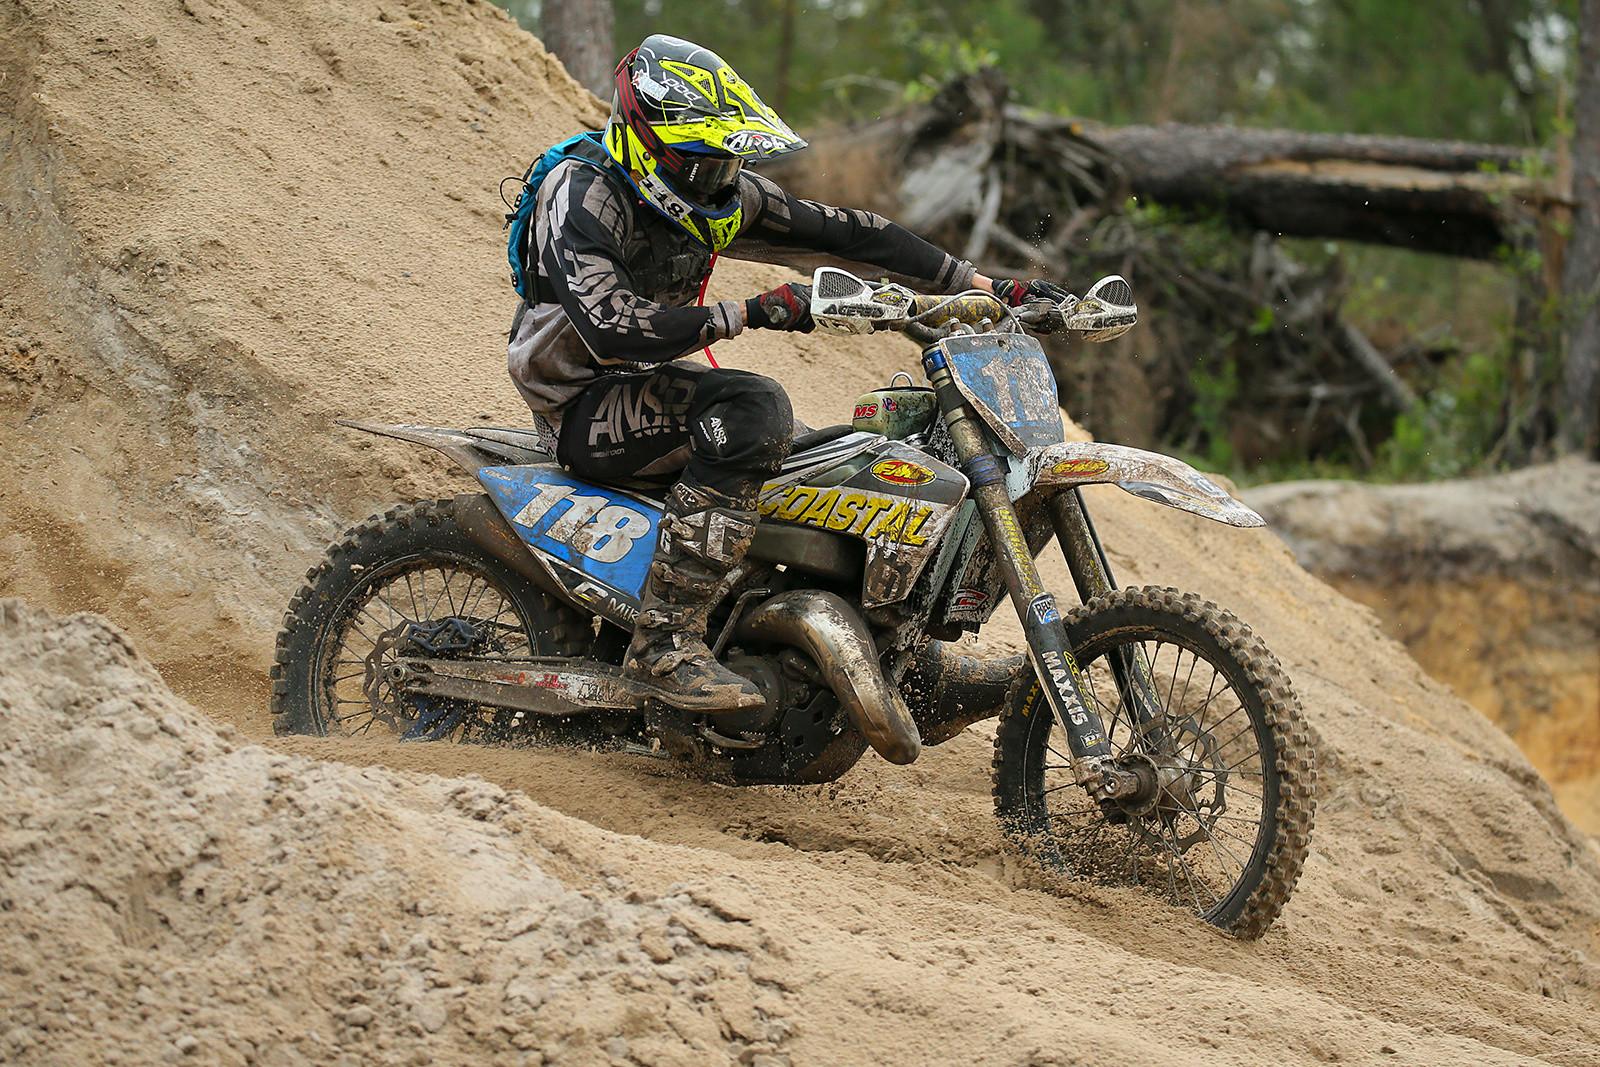 Jack Edmondson - Wild Boar GNCC - Motocross Pictures - Vital MX